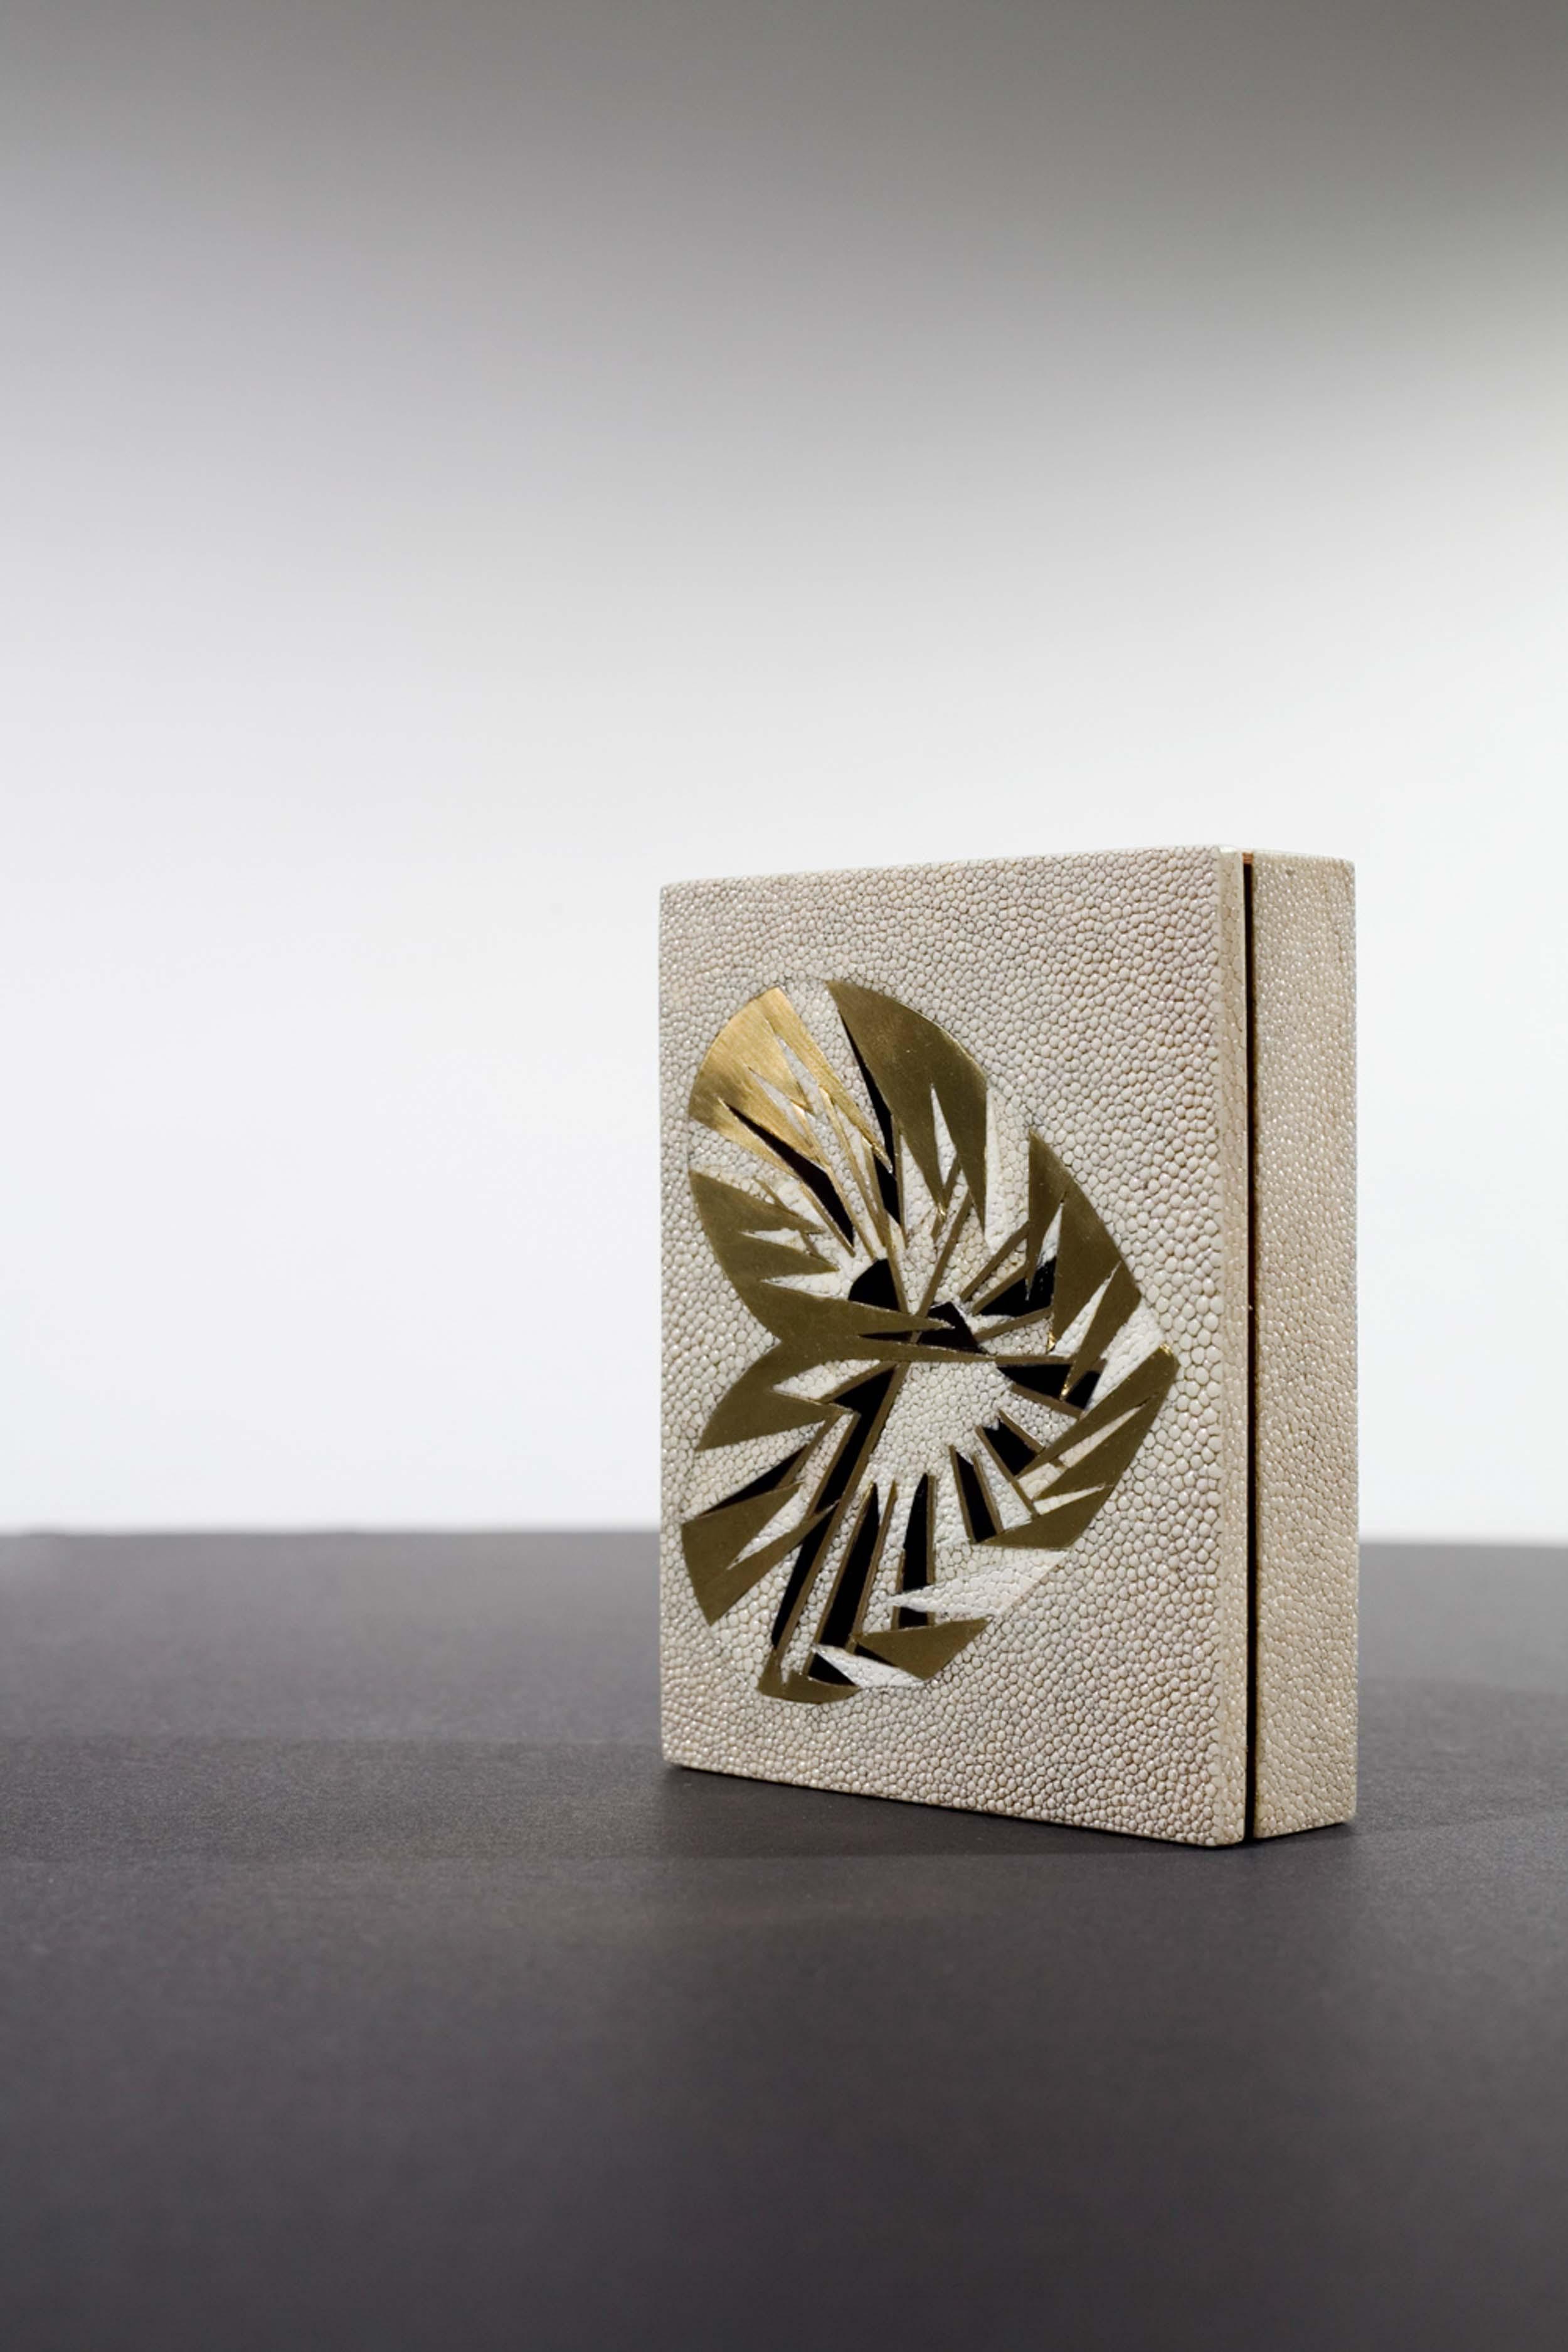 kifu-paris-patterns-textures-bugs-emblems-shagreen-brass